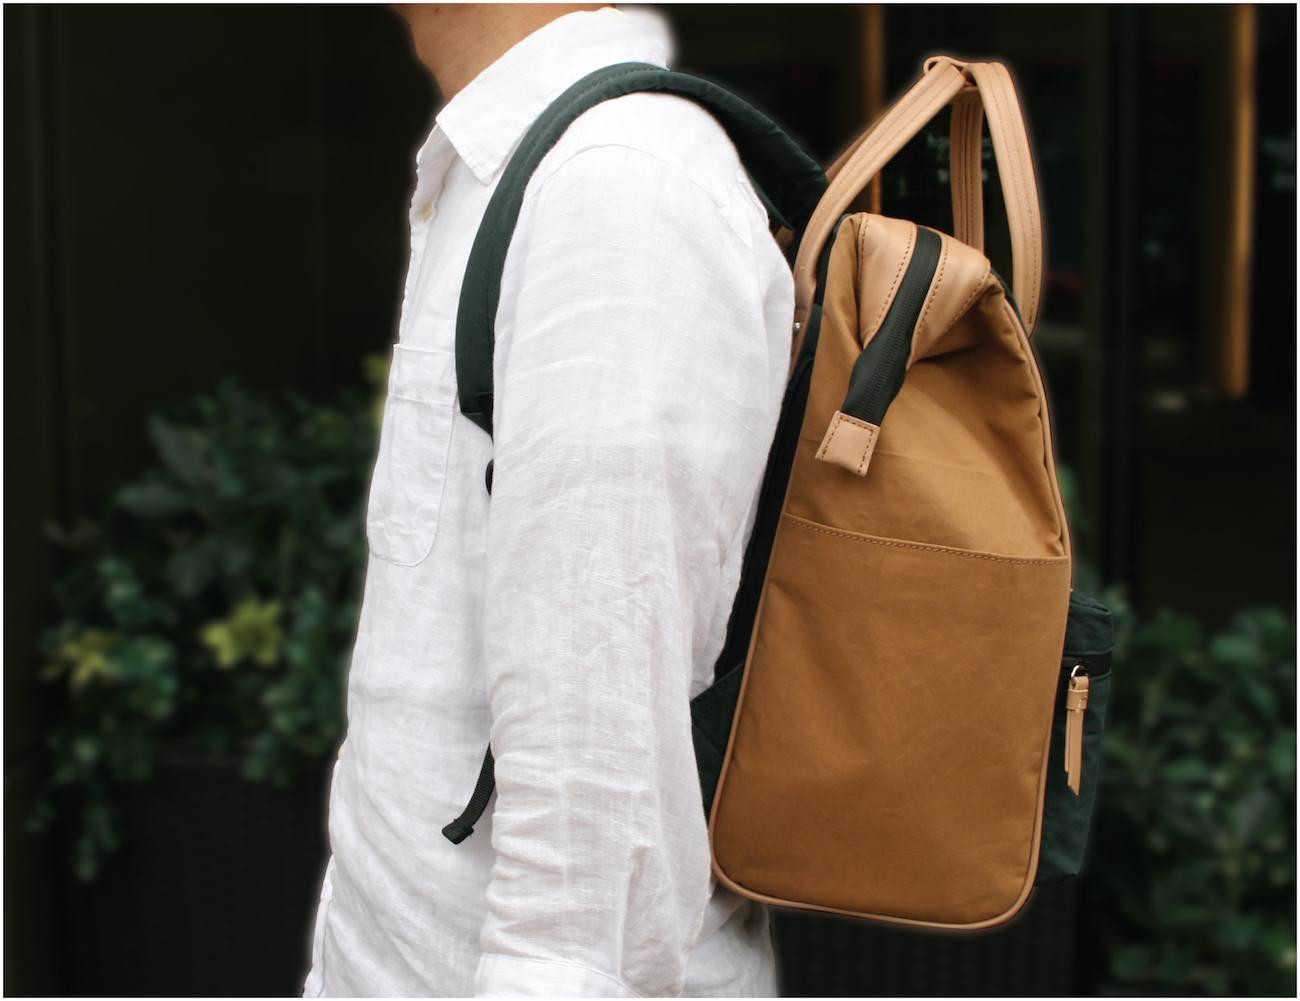 X-Bumper Multifunctional Backpack